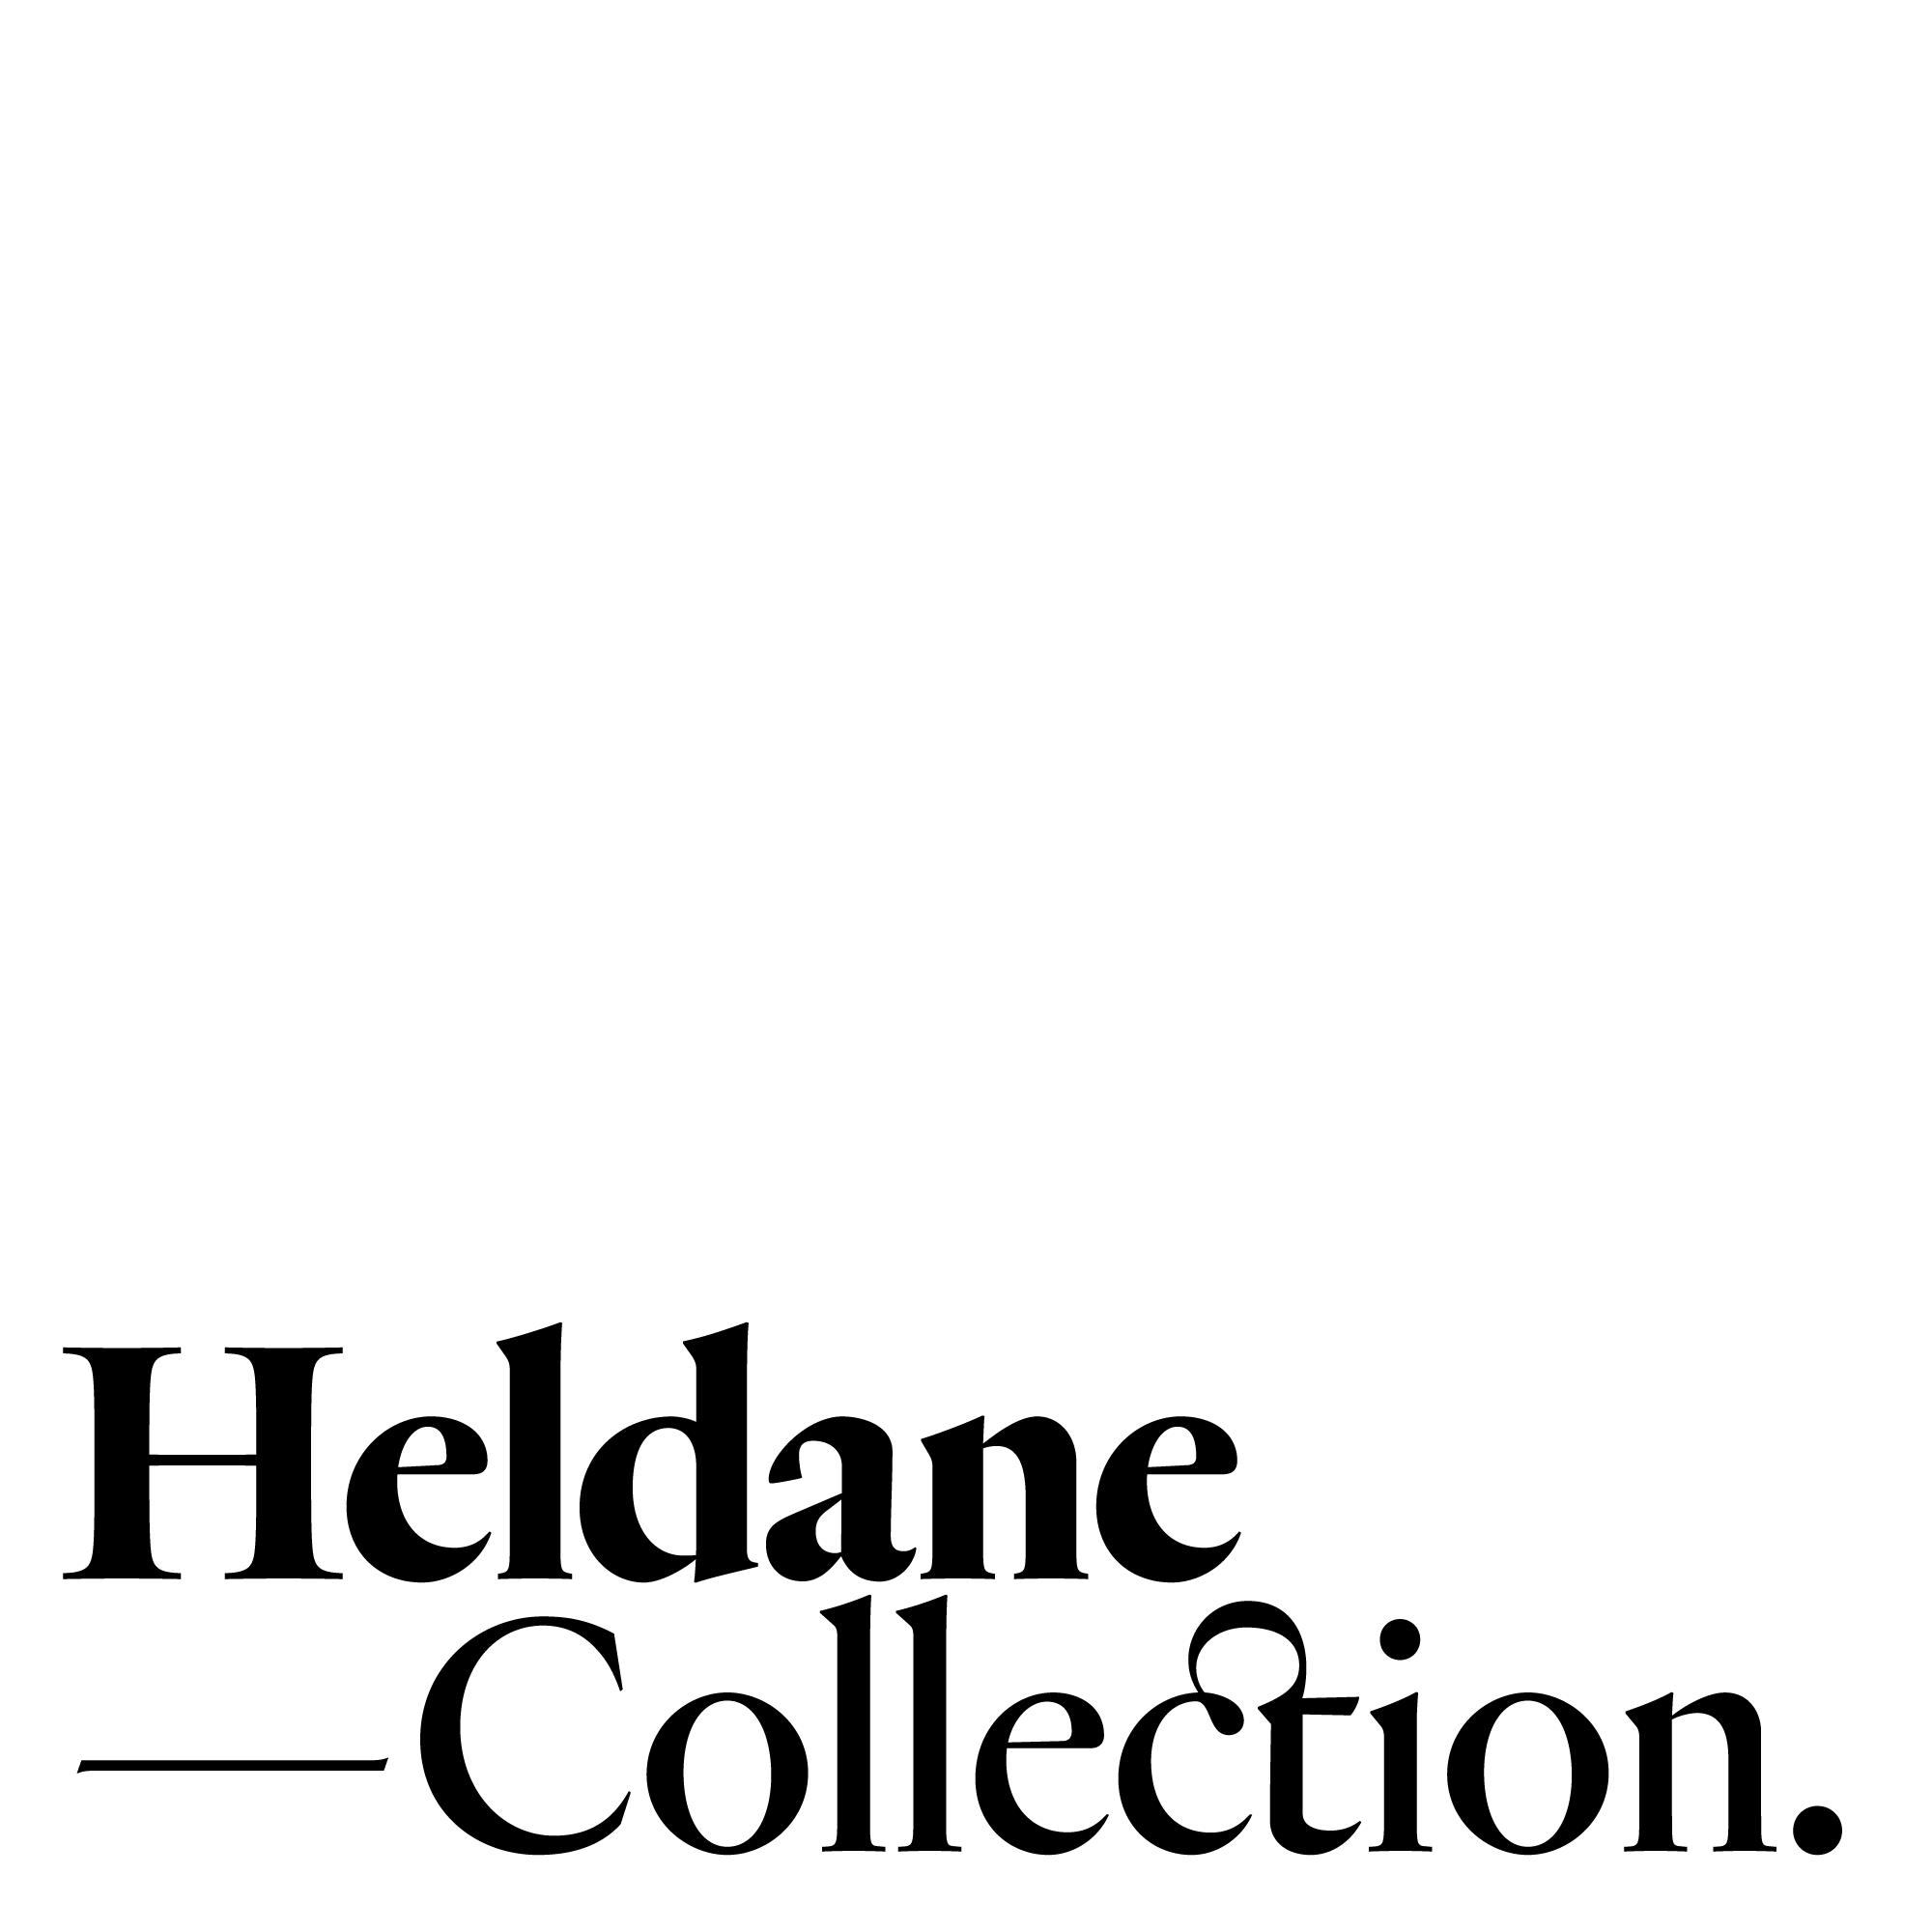 Heldane fonts